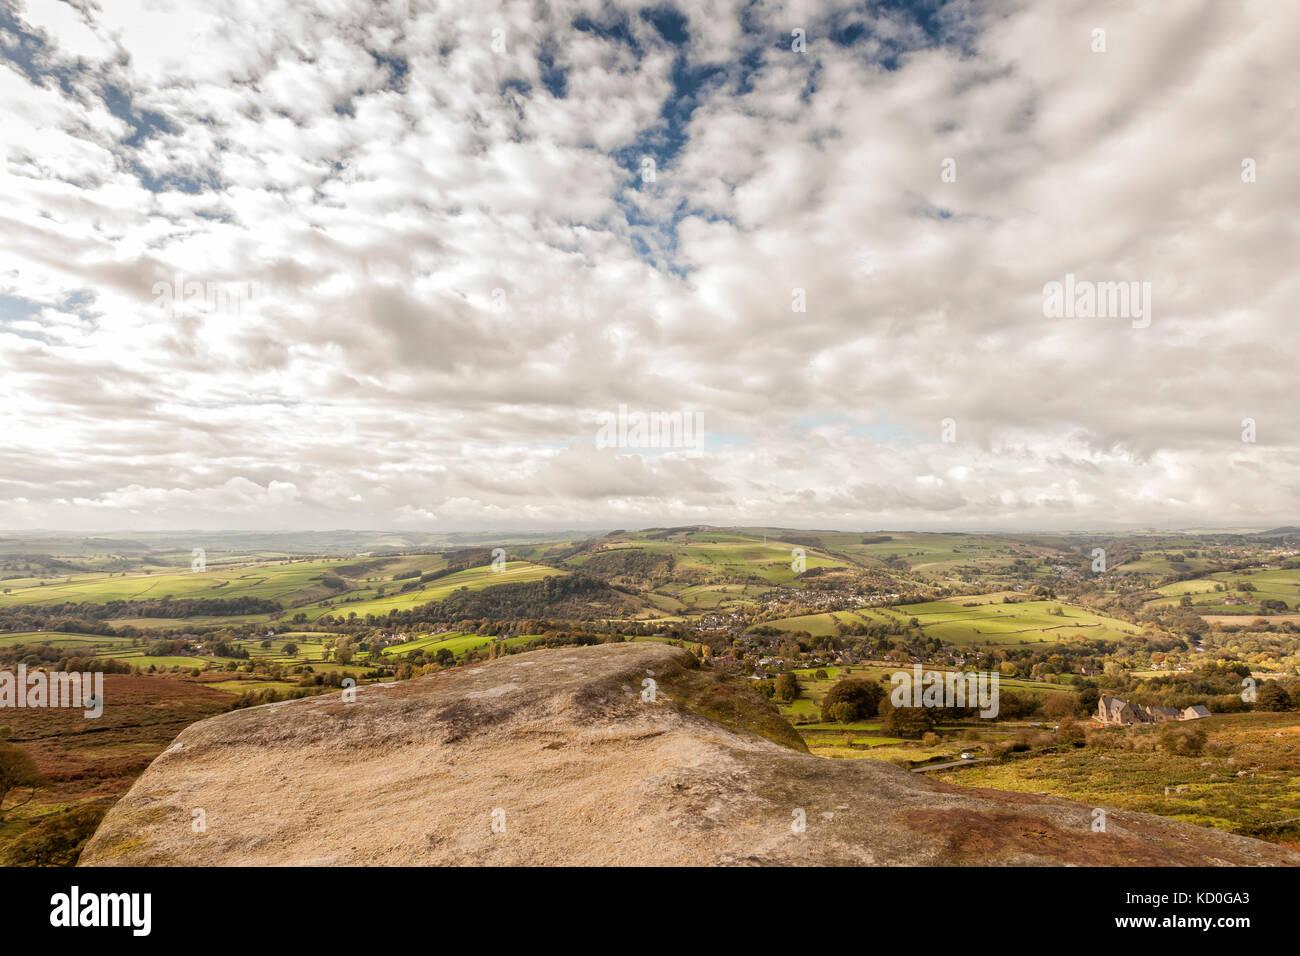 Curbar Edge, Peak District National Park,England. October 2017 - Stock Image